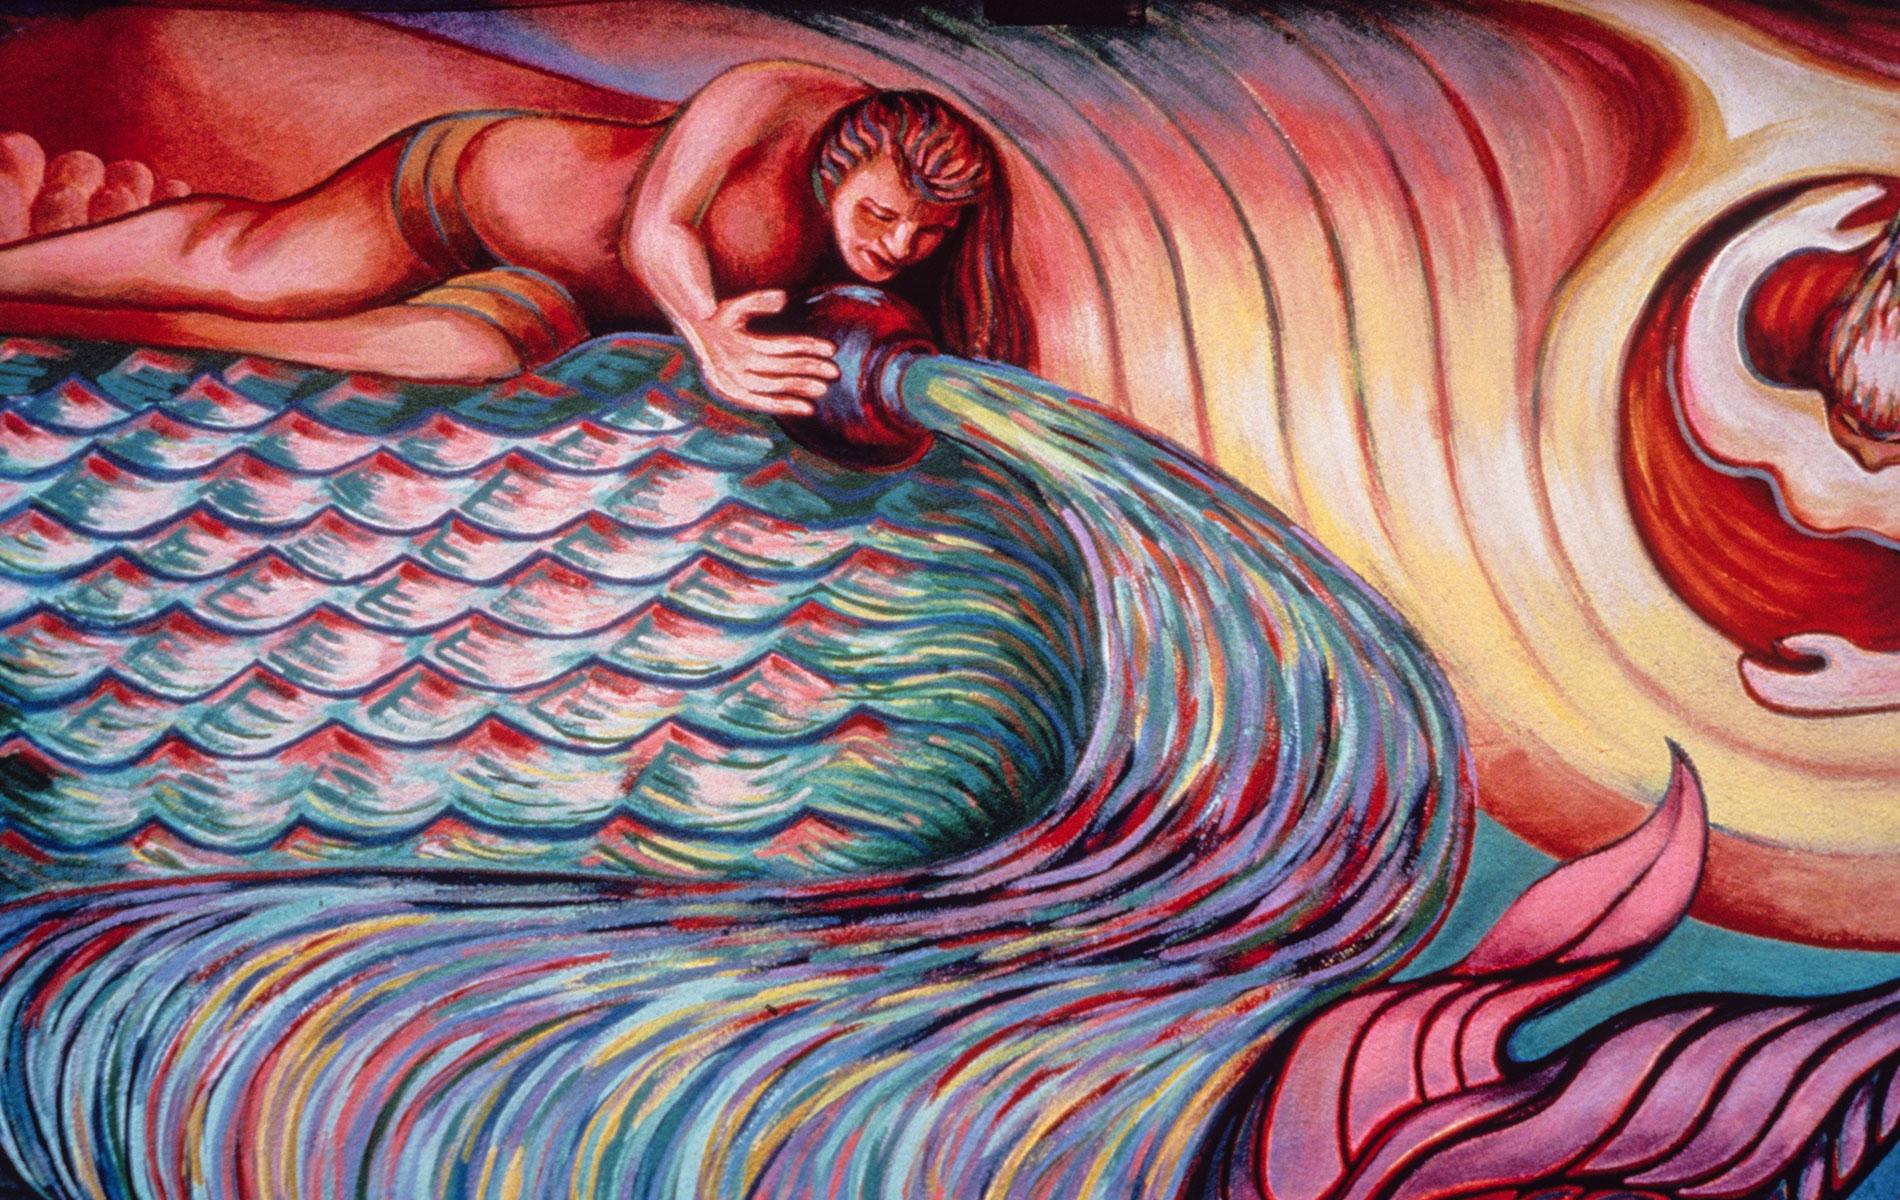 <h1>Mural detail, <em>Resurrection of the Green Planet</em>, c. 1991</h1>